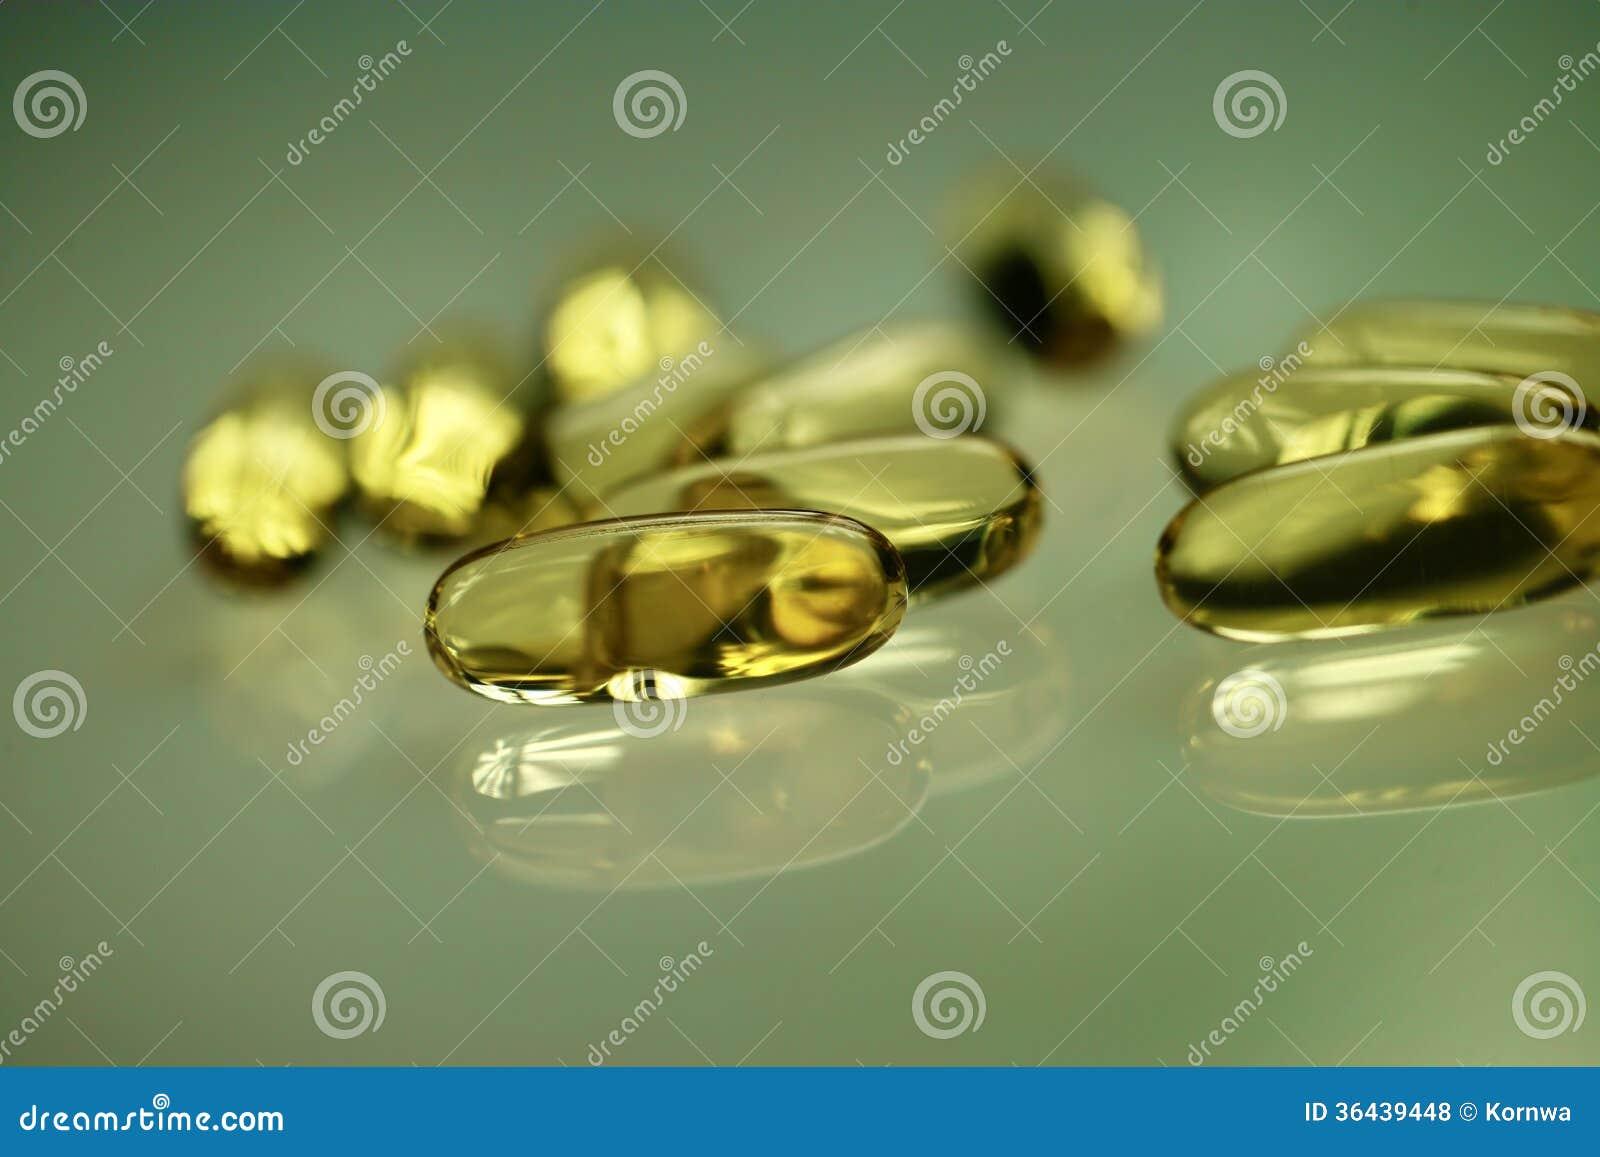 Drogas ou vitaminas